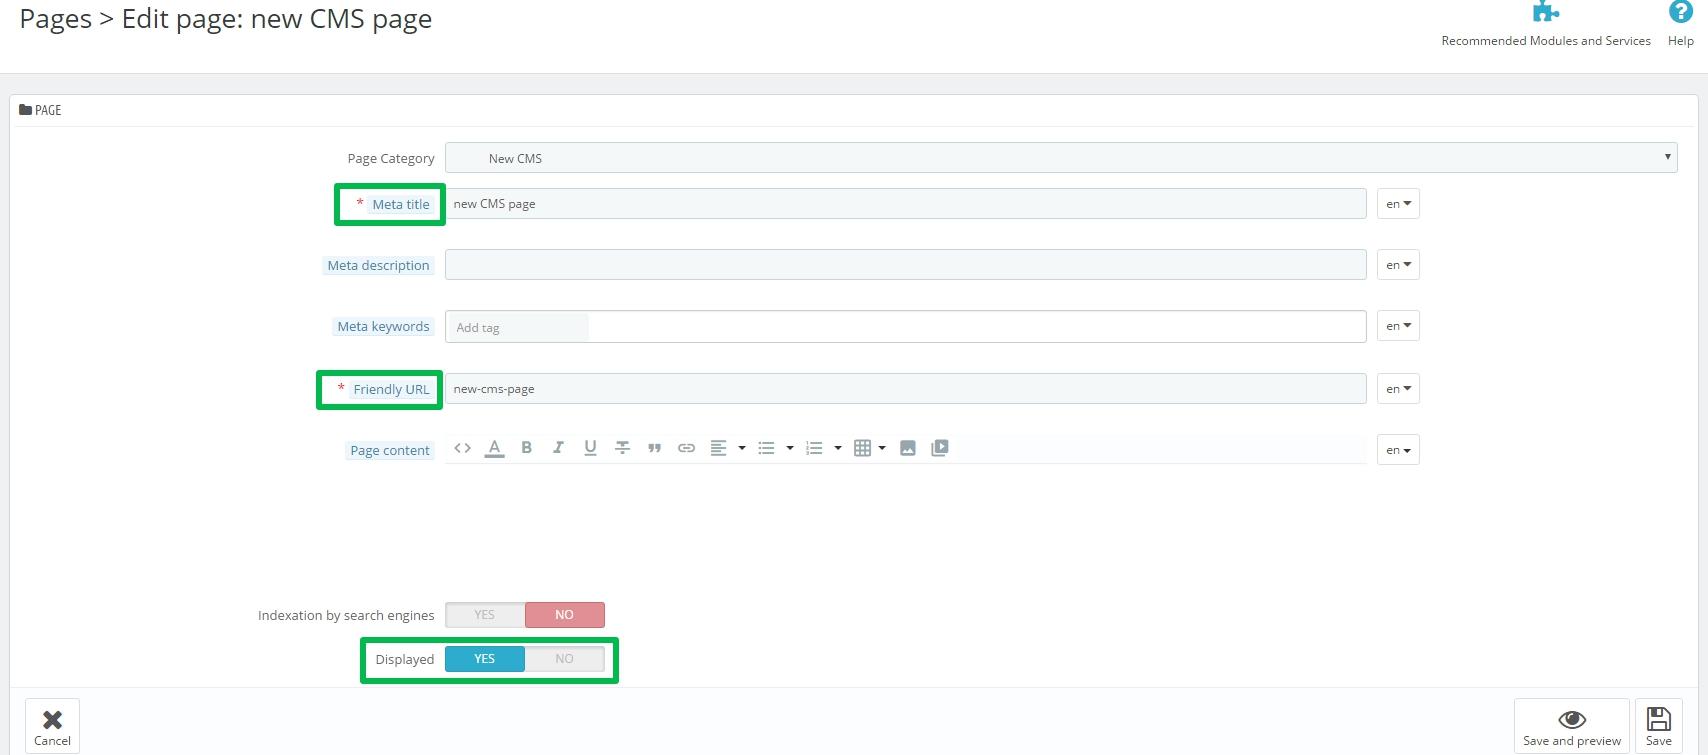 How to Add Categories in a Drop Down Menu in Prestashop 1.7